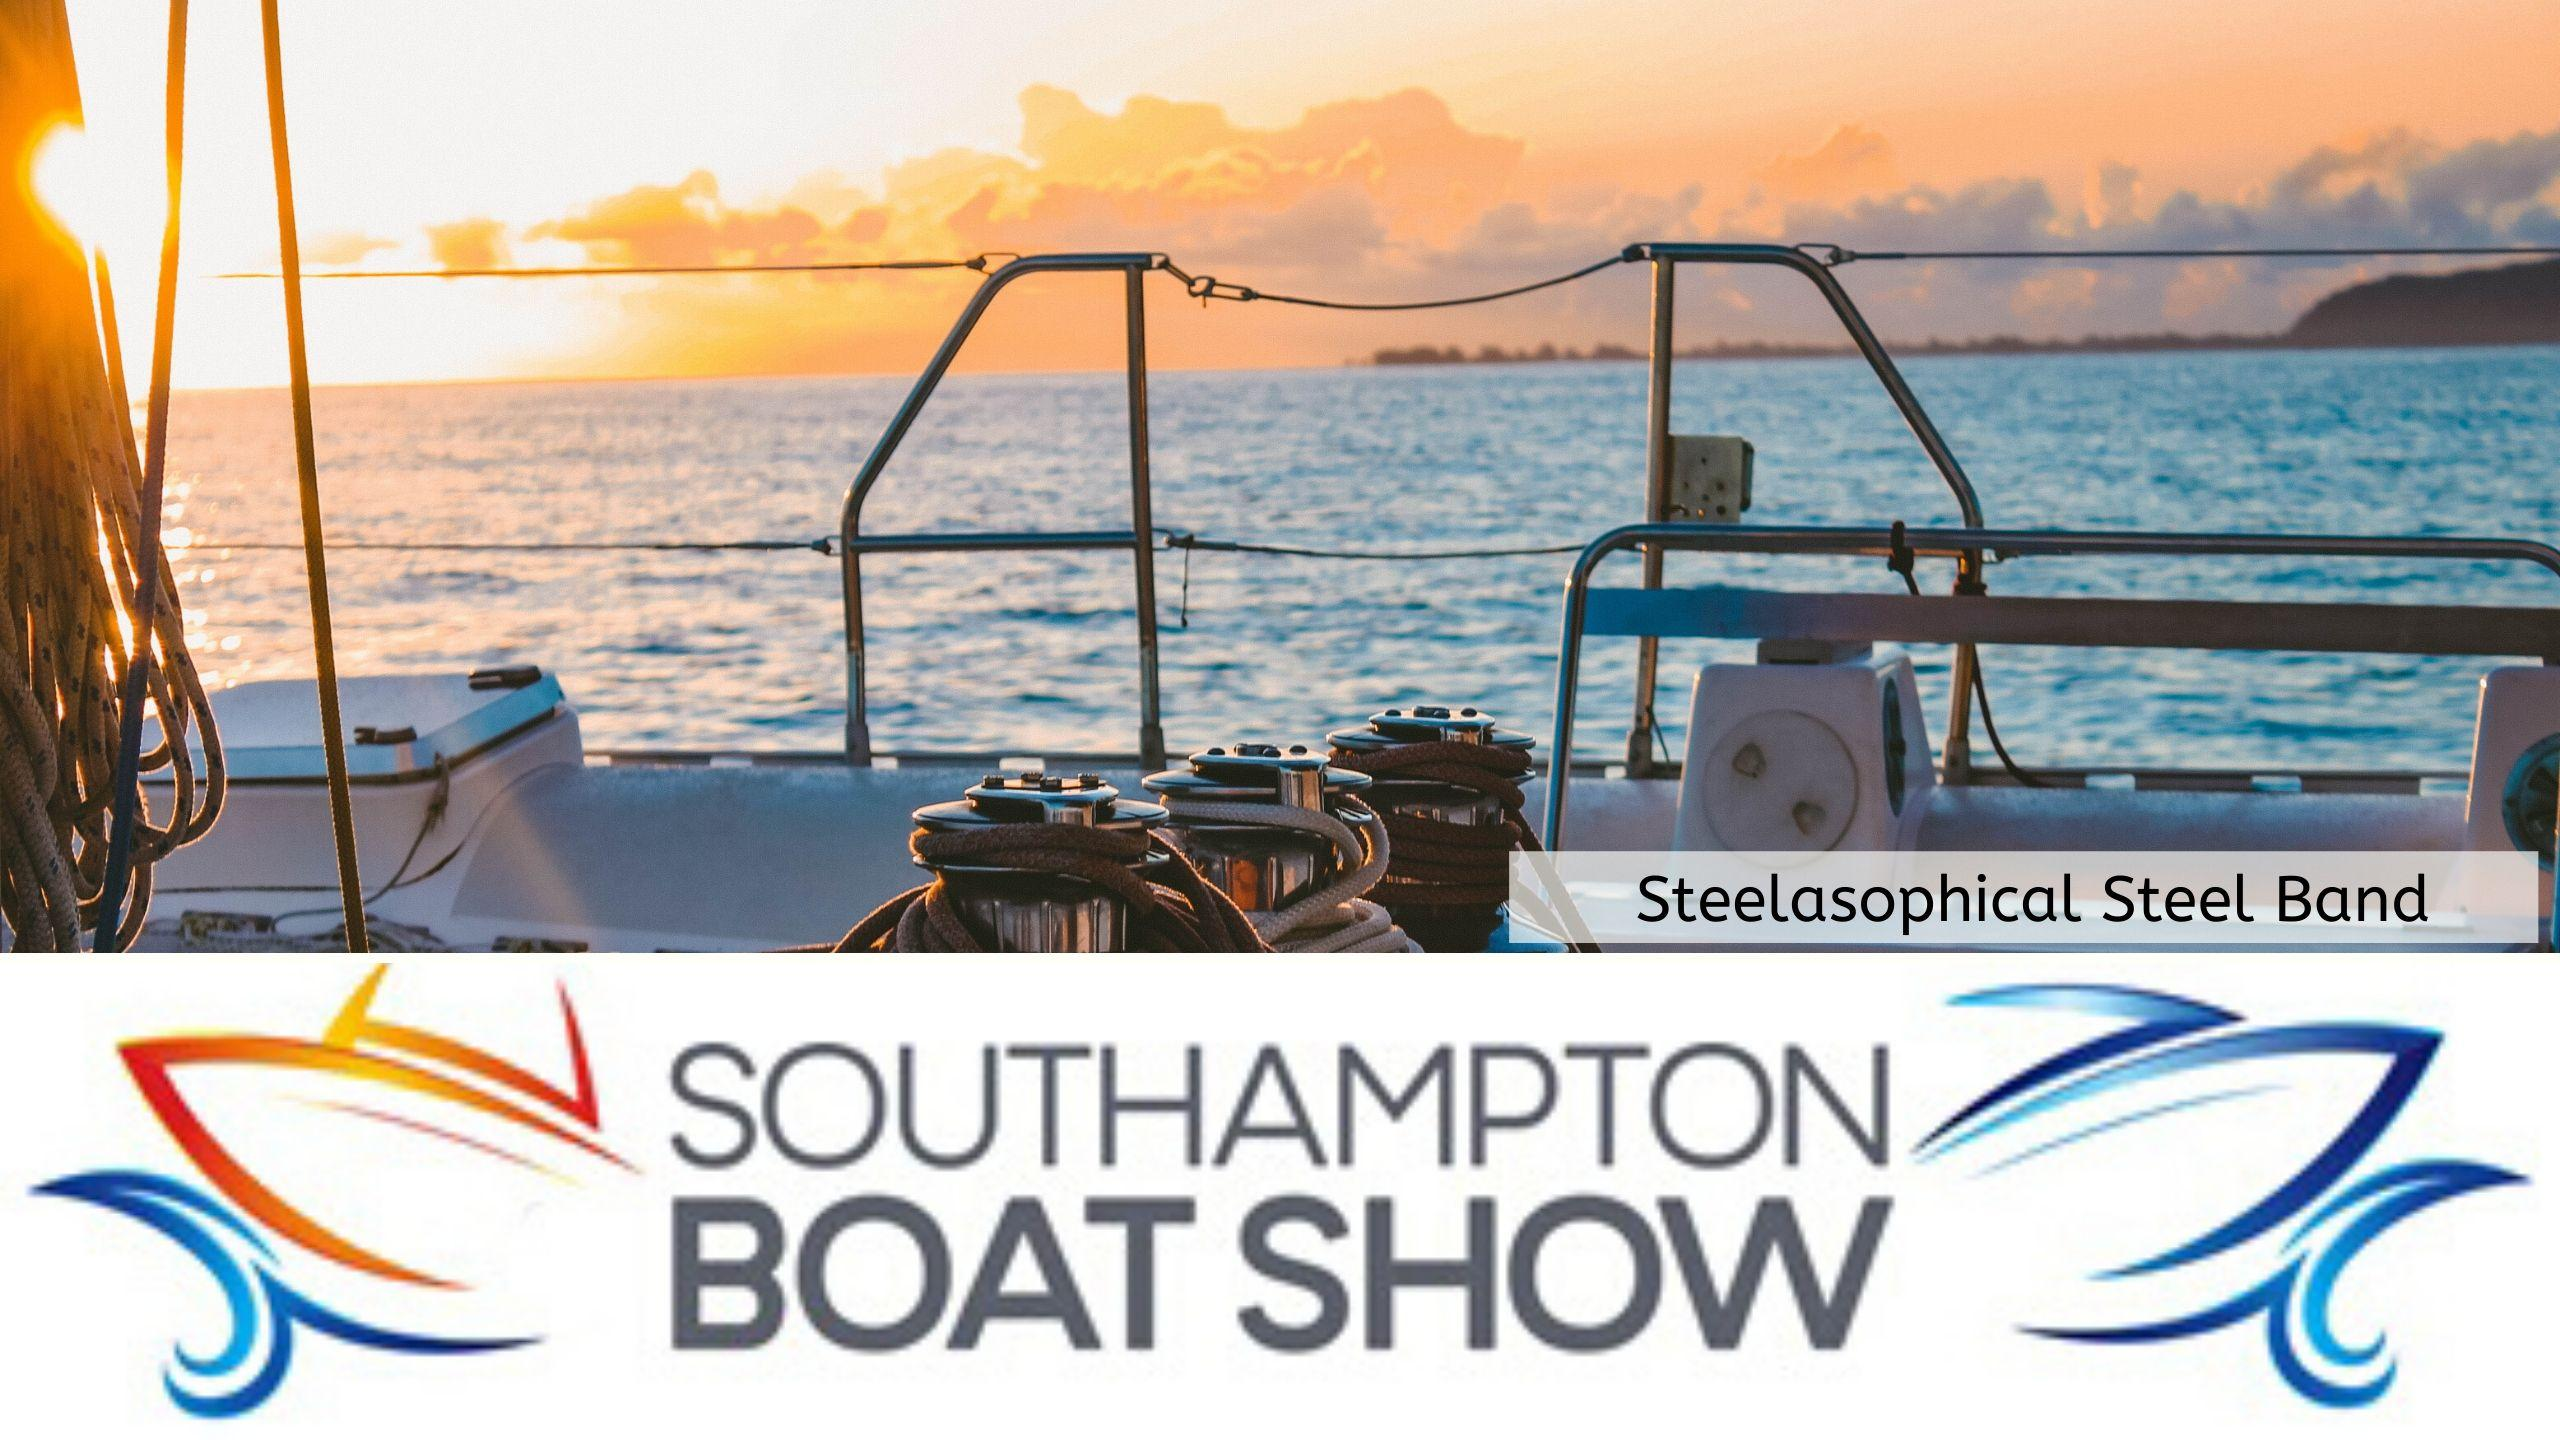 Steelasophical Steel Band Southampton Boat Show Yacht Market 2018